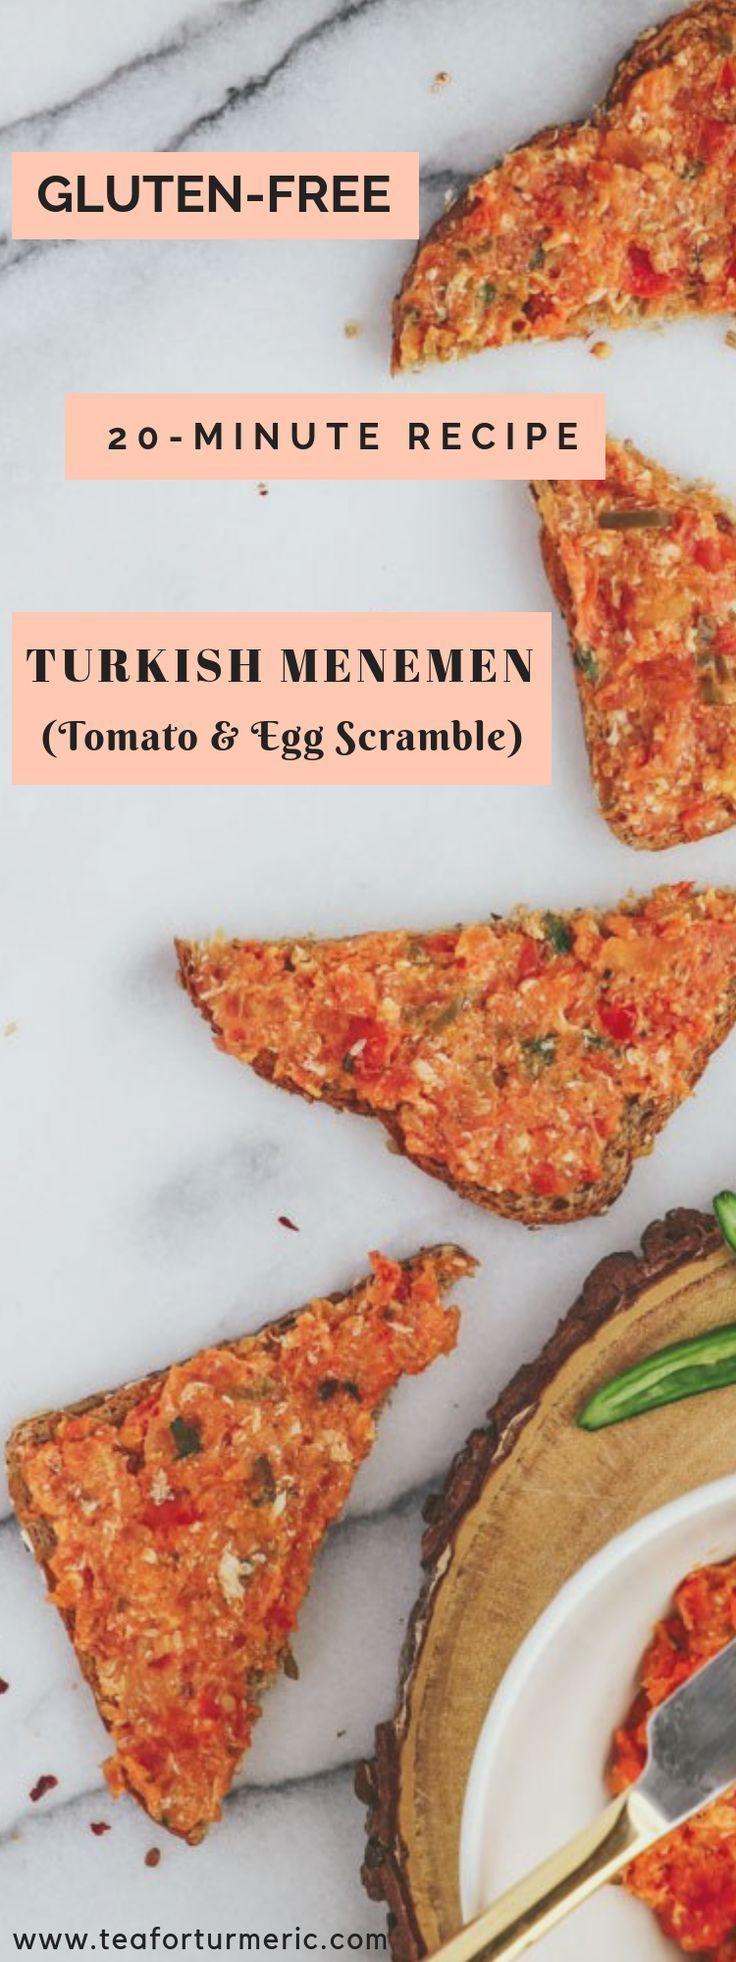 Traditional Turkish Menemen (Tomato and Egg Scramble)